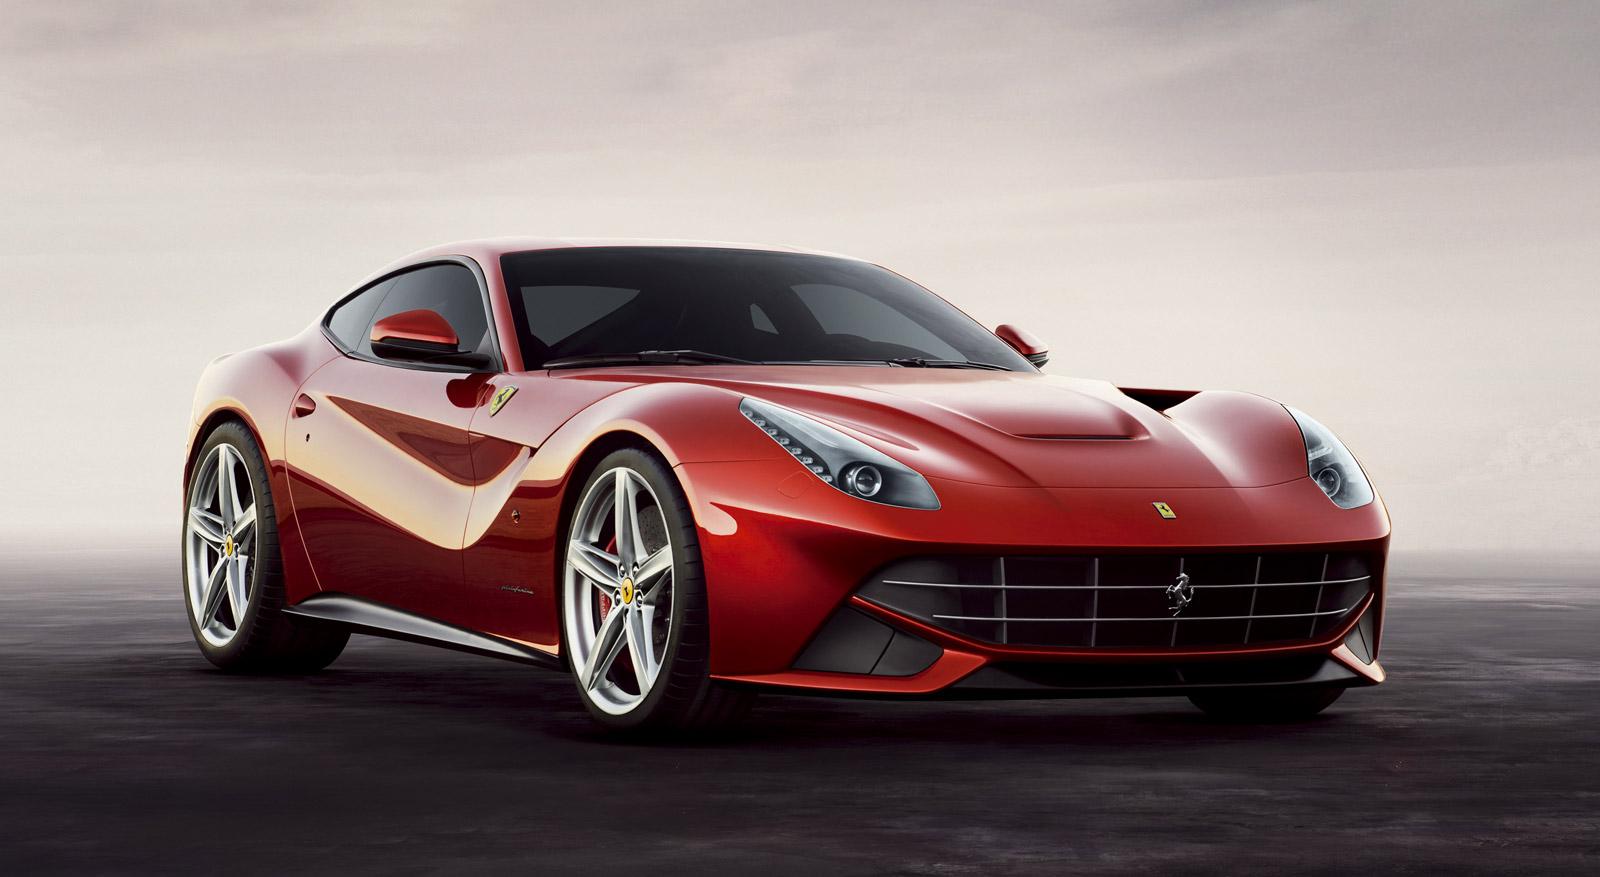 Ferrari F12 Berlinetta Supercar Revealed